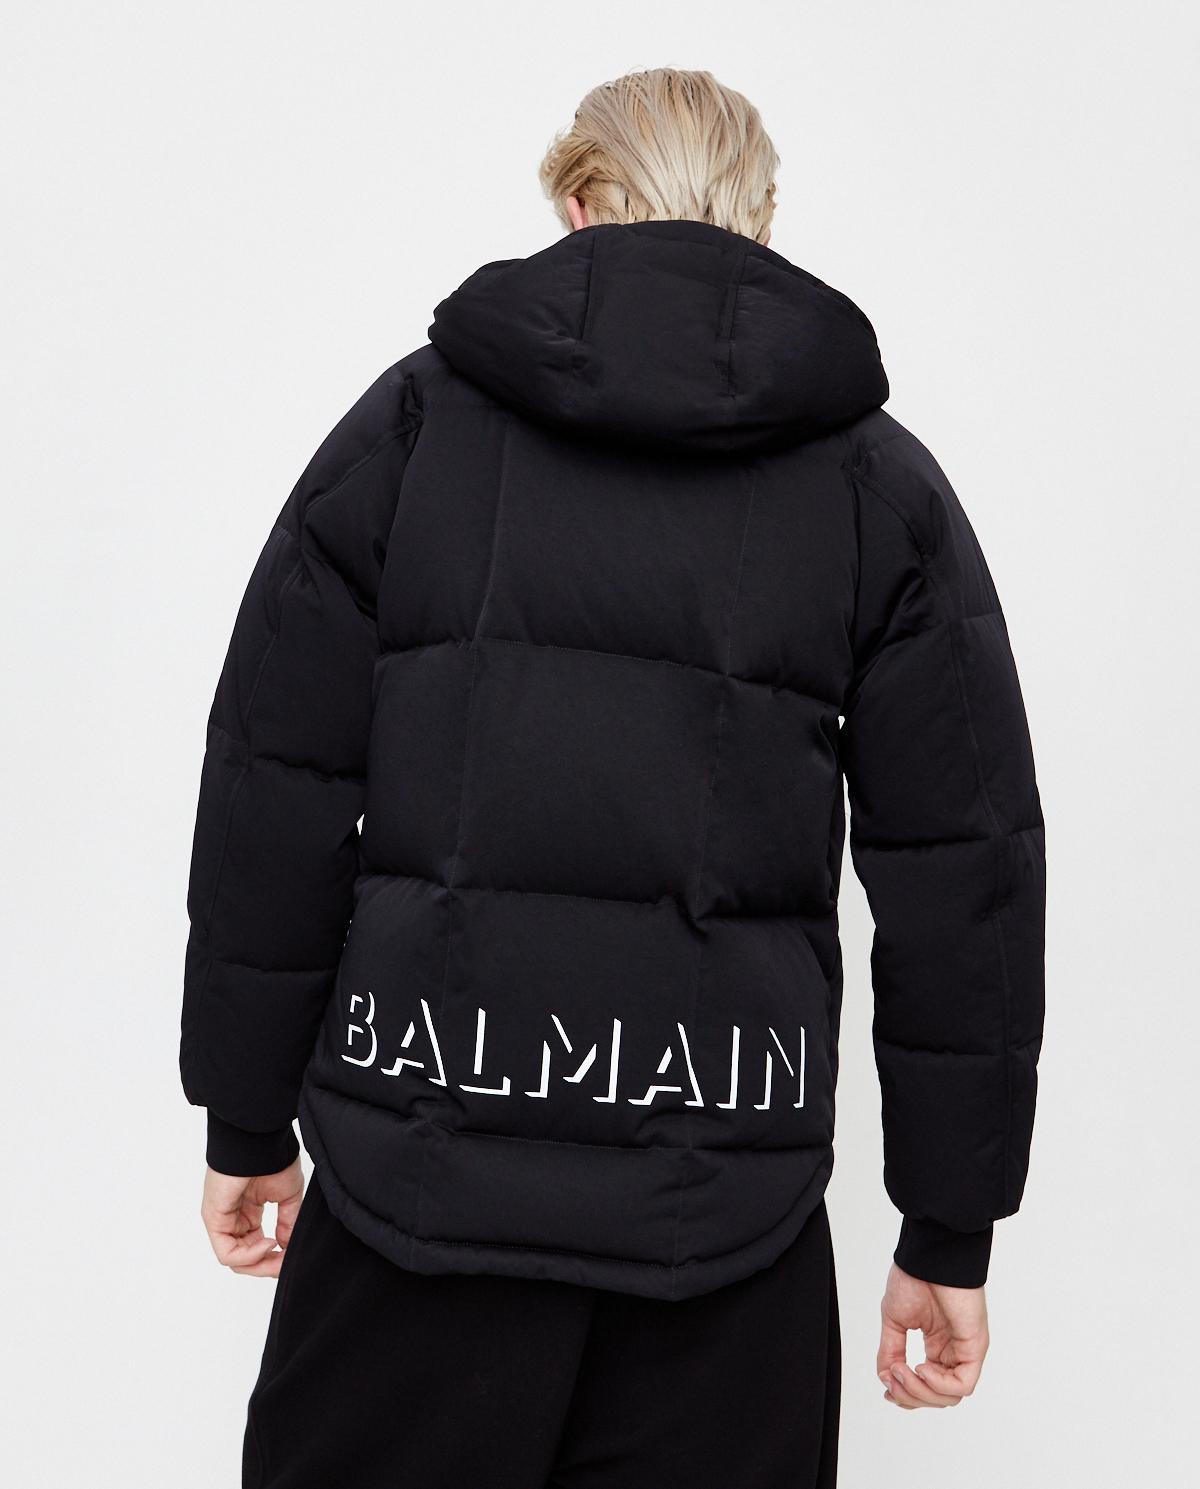 Czarna kurtka puchowa z logo Balmain UH18817X113 0PA